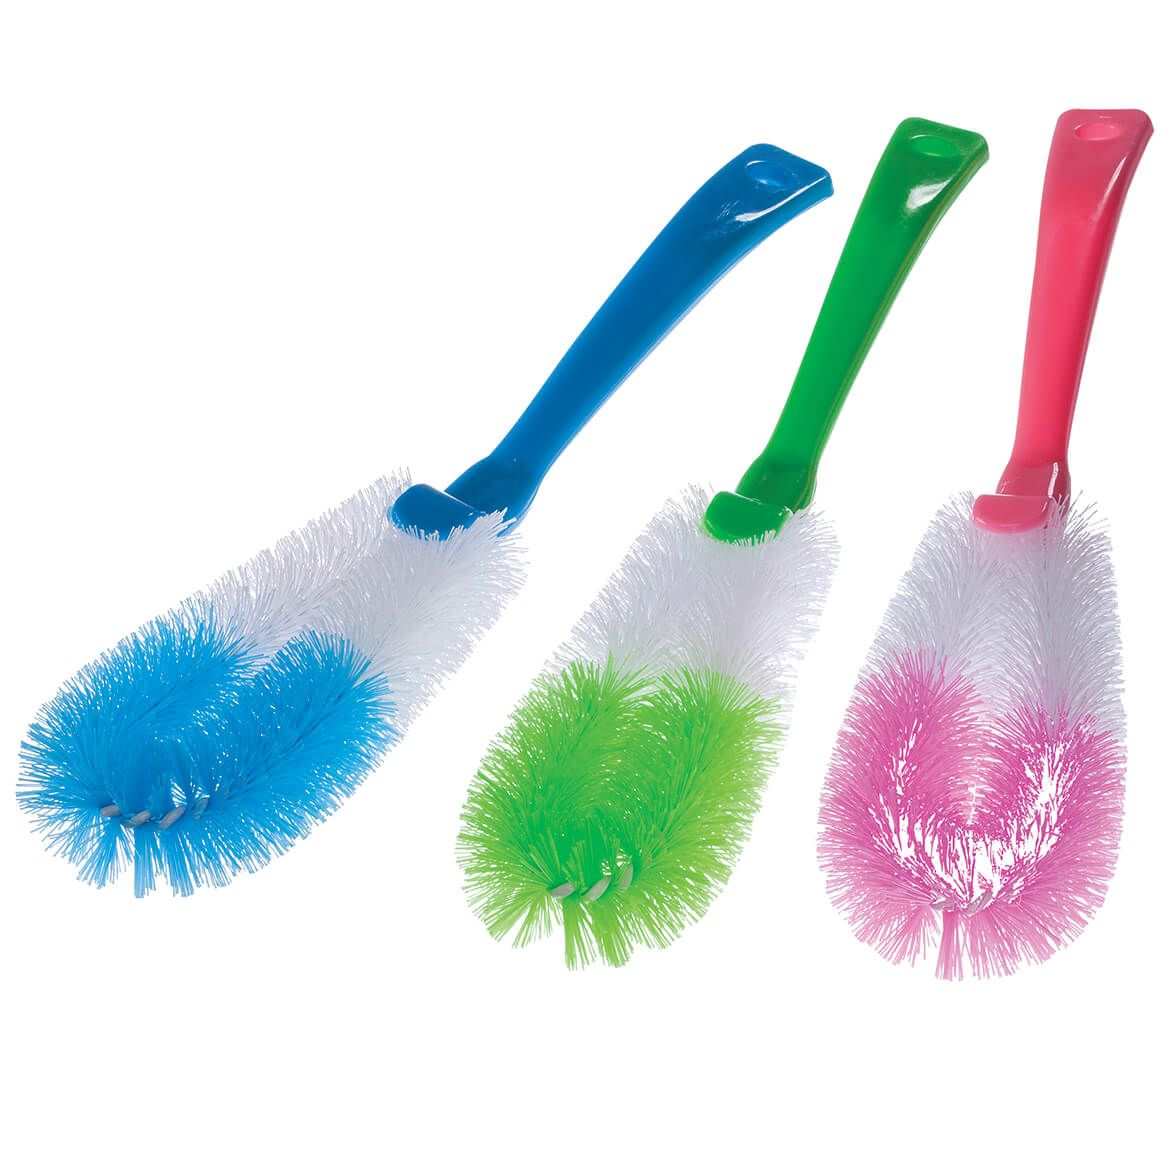 3 in 1 Blender, Bottle & Cup Cleaning Brush, Set of 3-370751